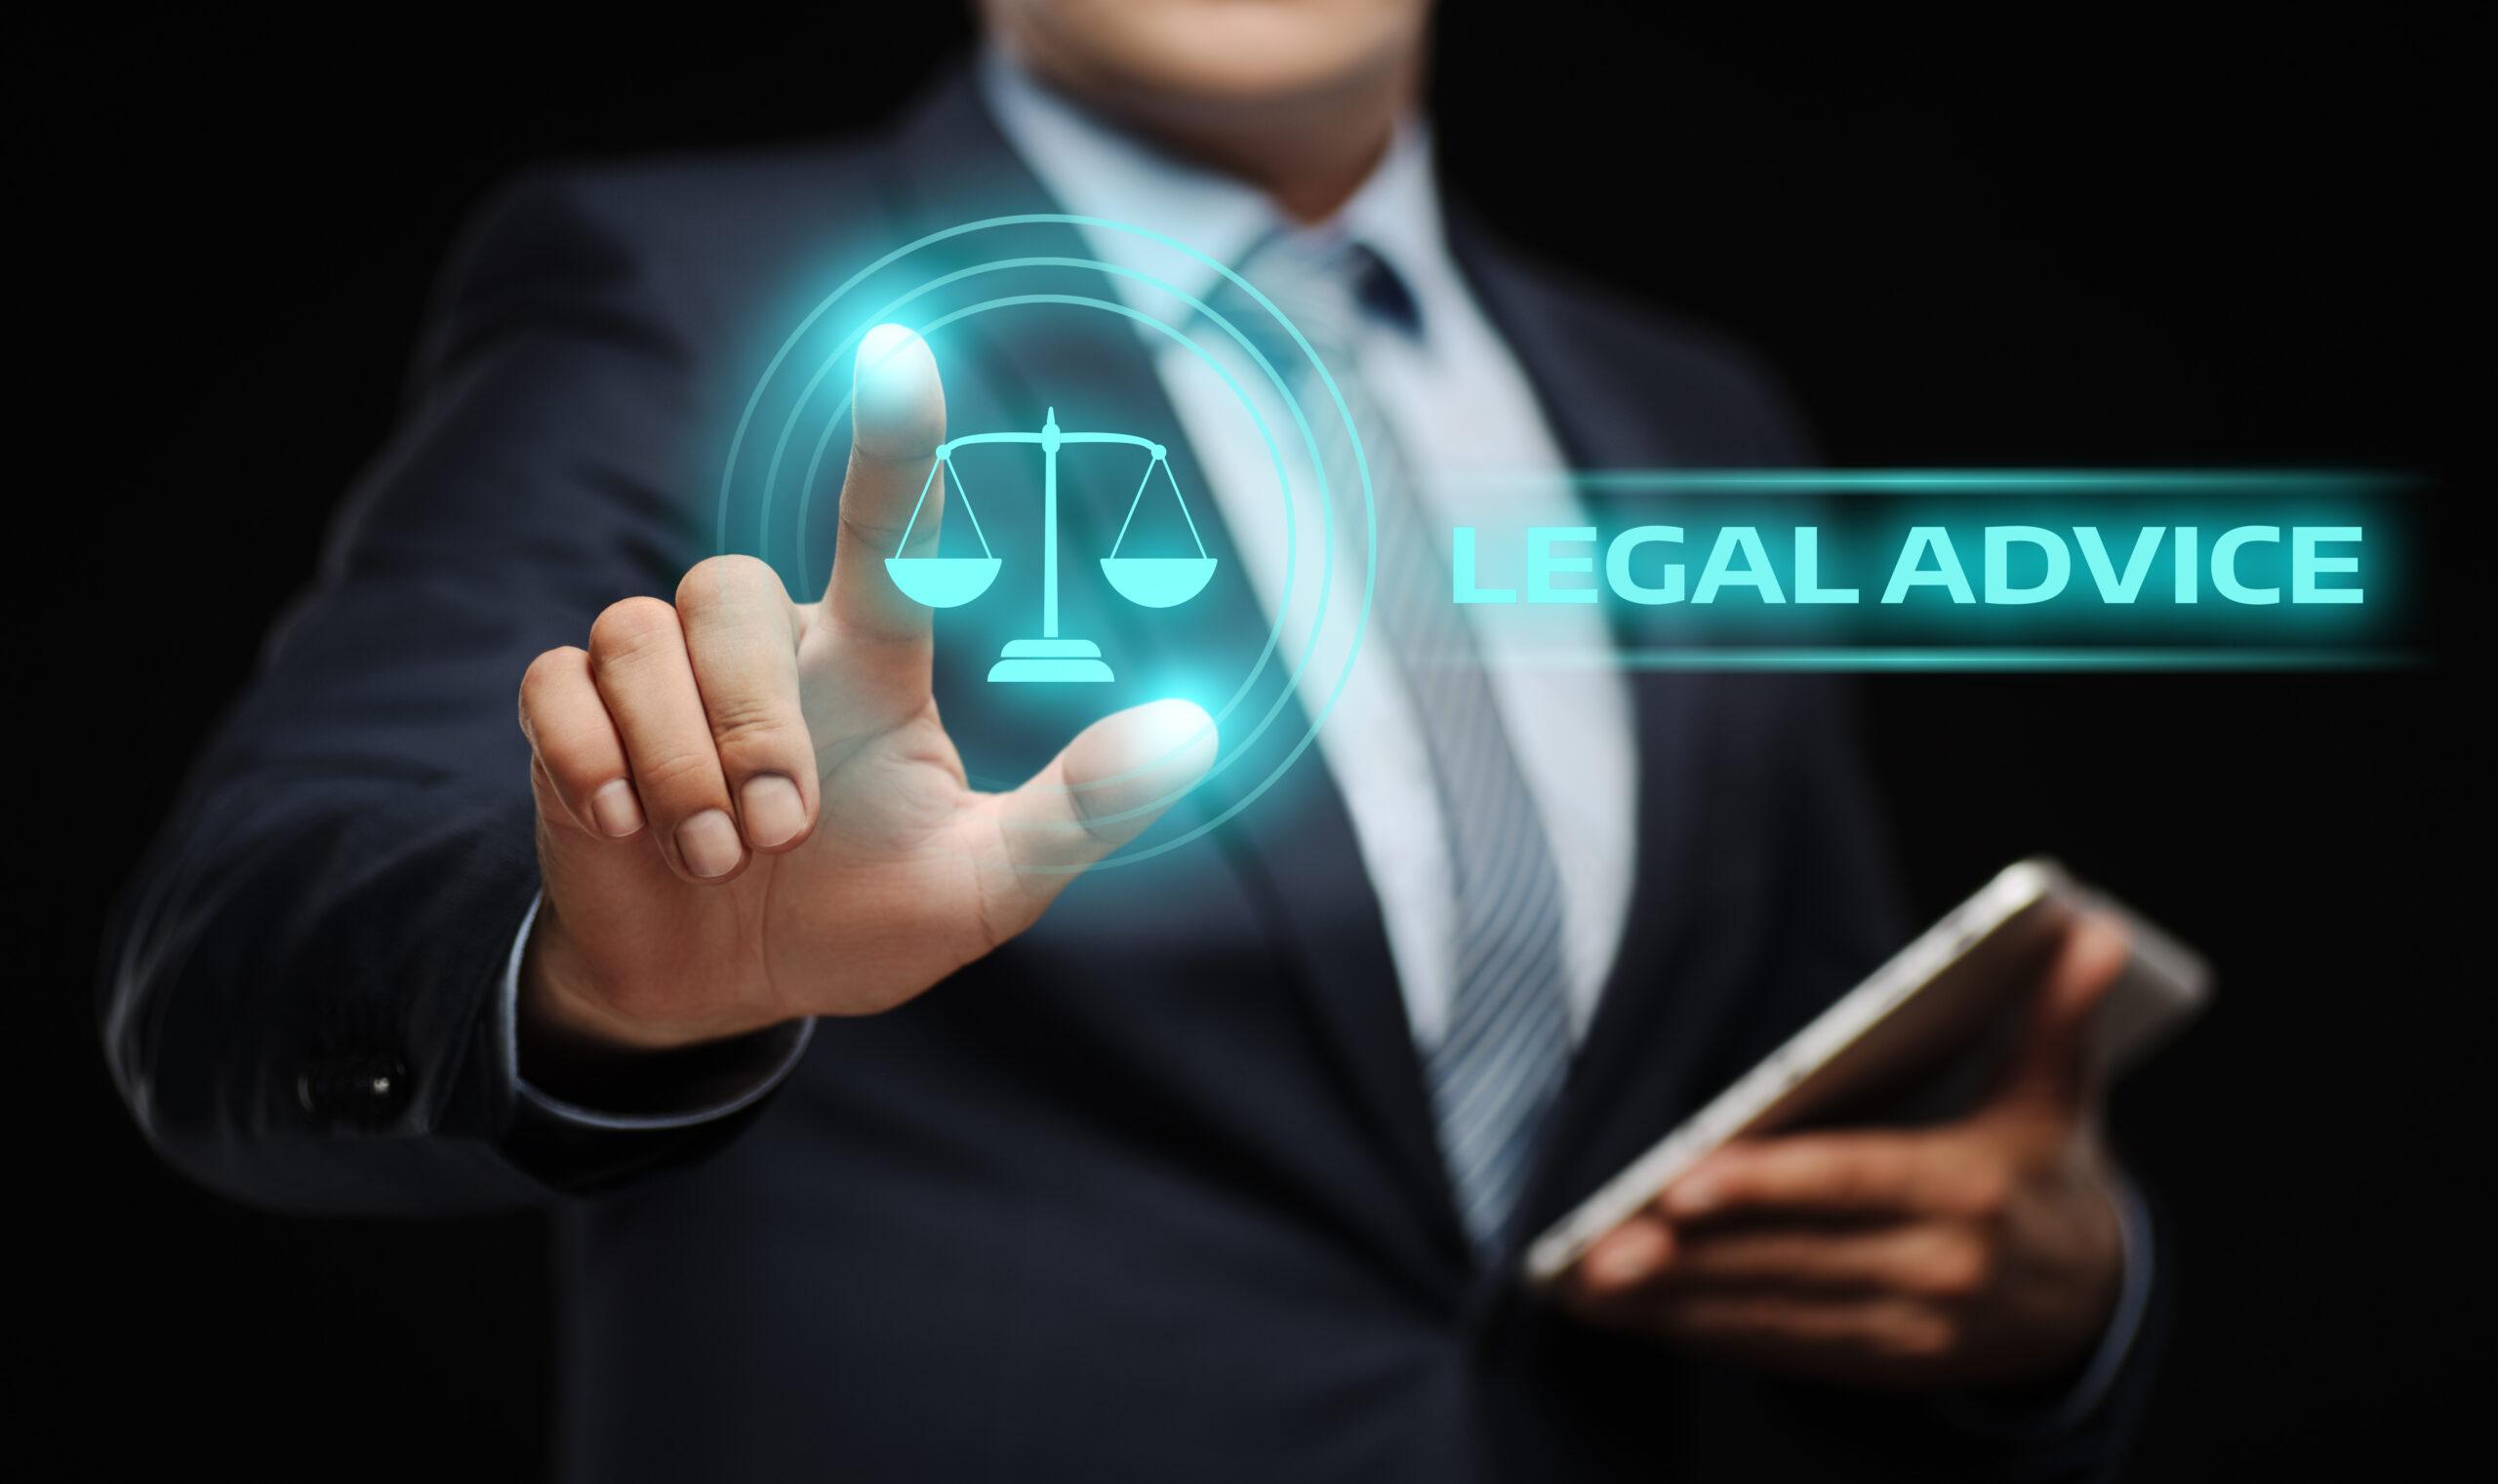 顧問弁護士 活用の仕方